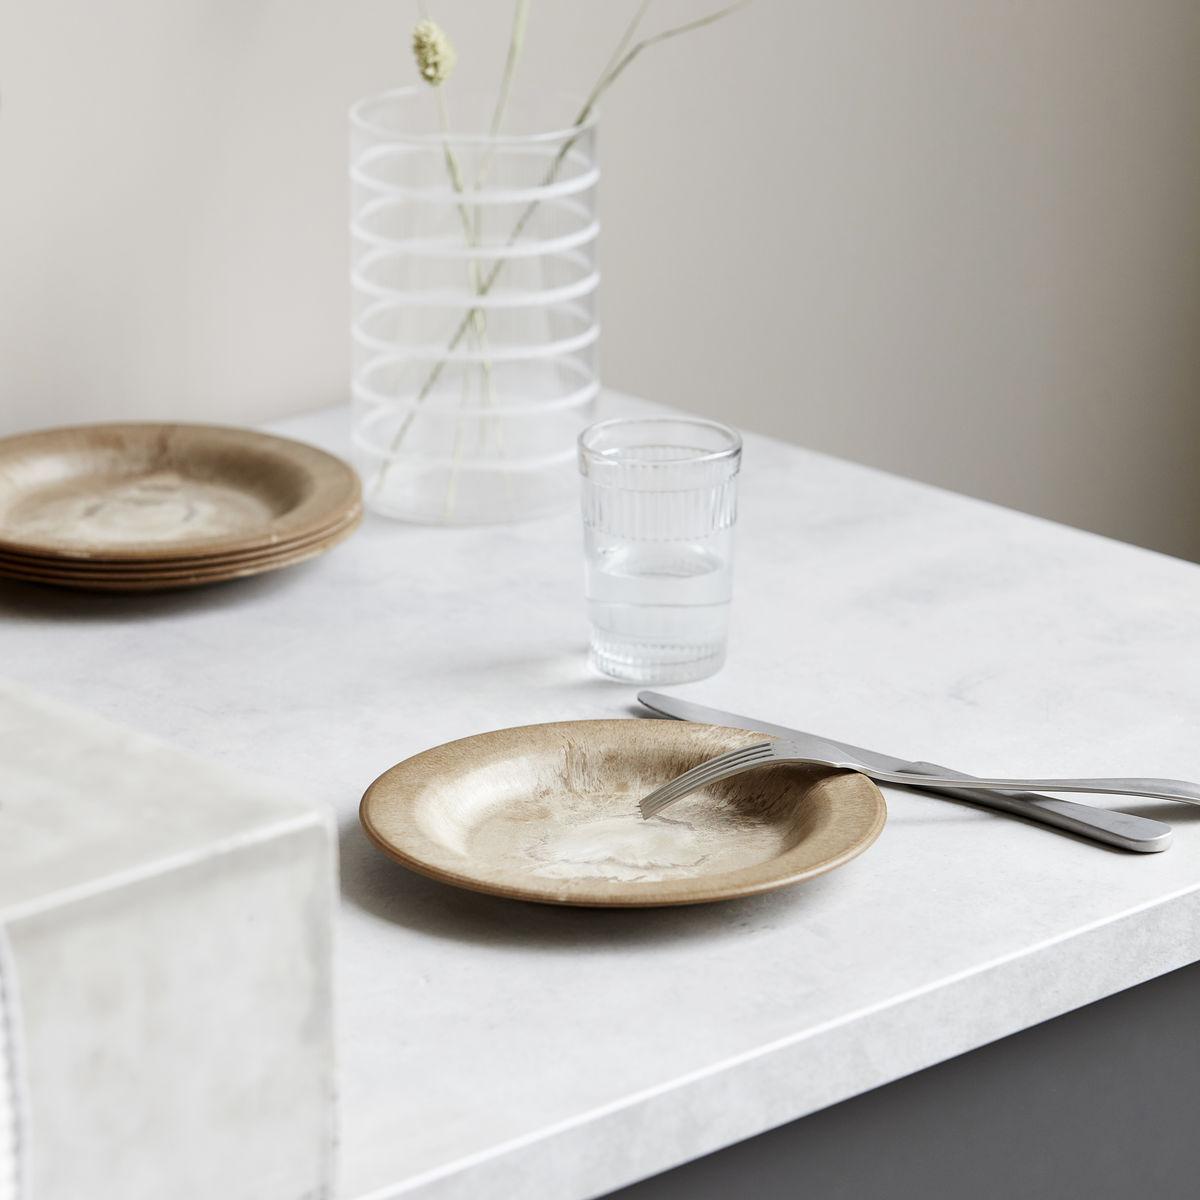 plastic brown plate